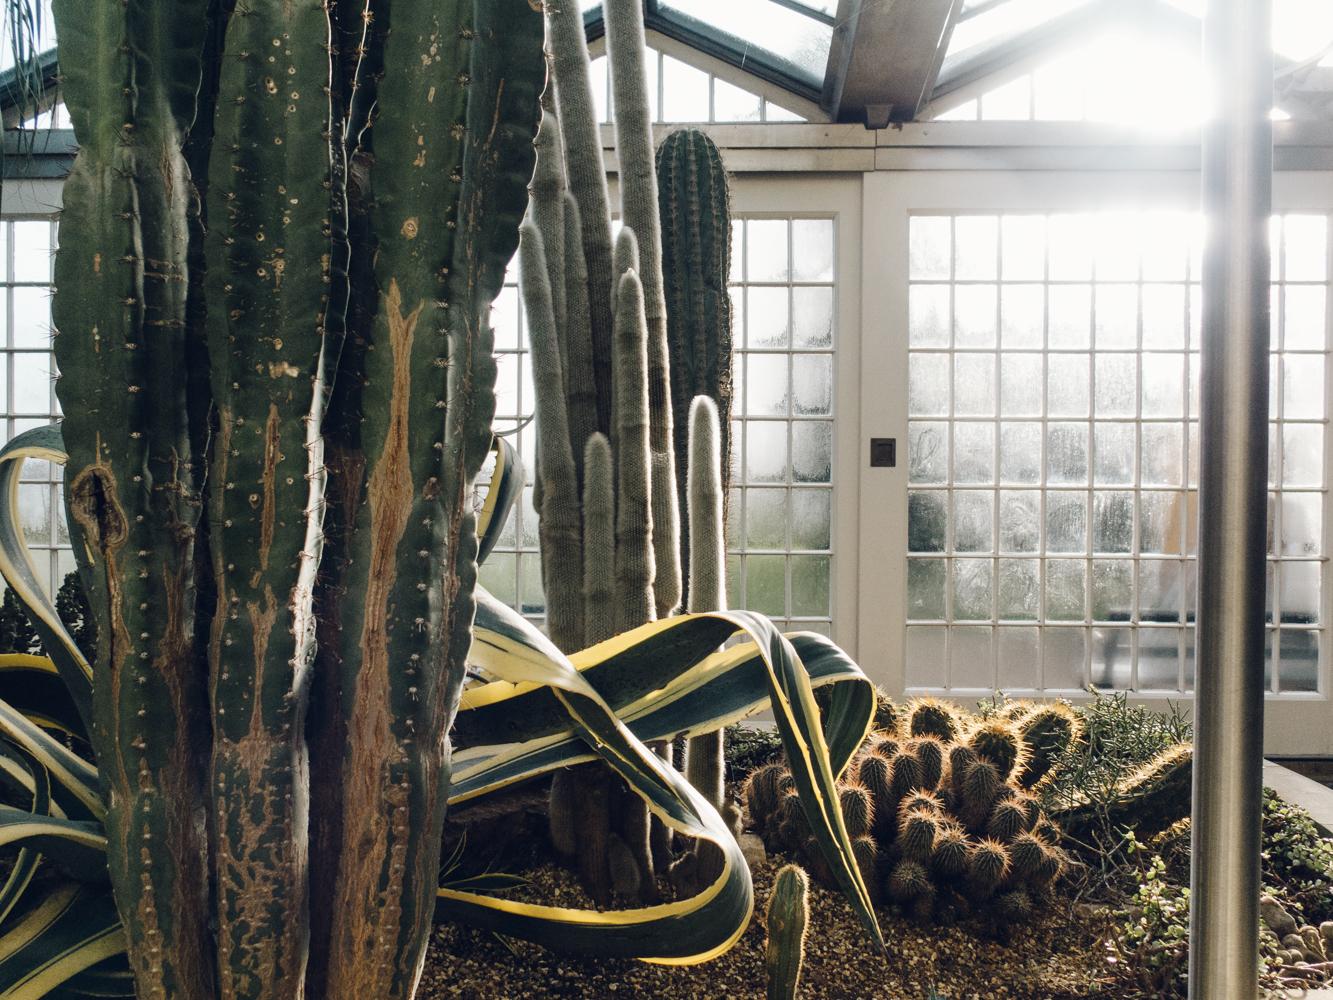 Haarkon Sheffield Botanical Gardens Pavilion Glasshouse Greenhouse Victorian Plants Greenery Park Cacti Cactus